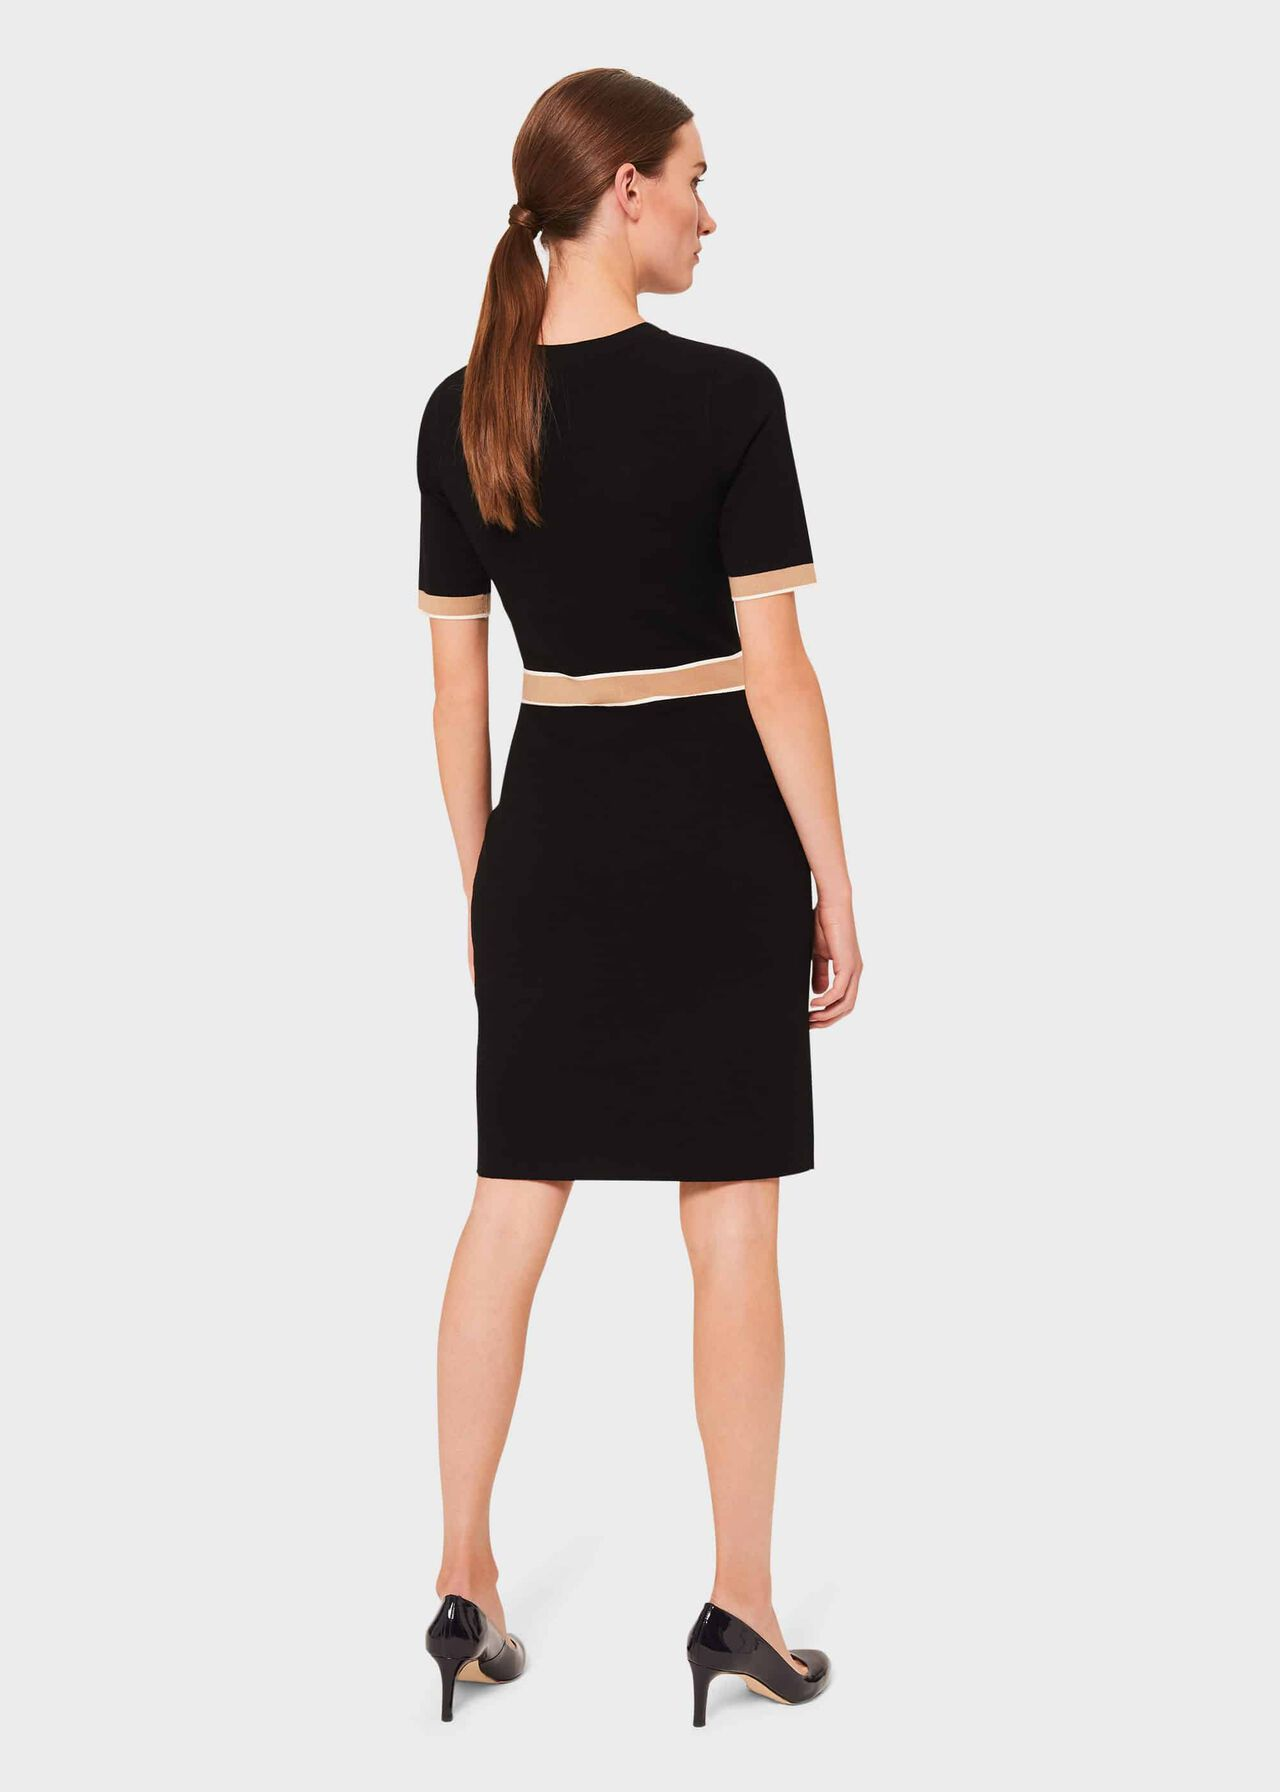 Aria Knitted Dress, Black Multi, hi-res